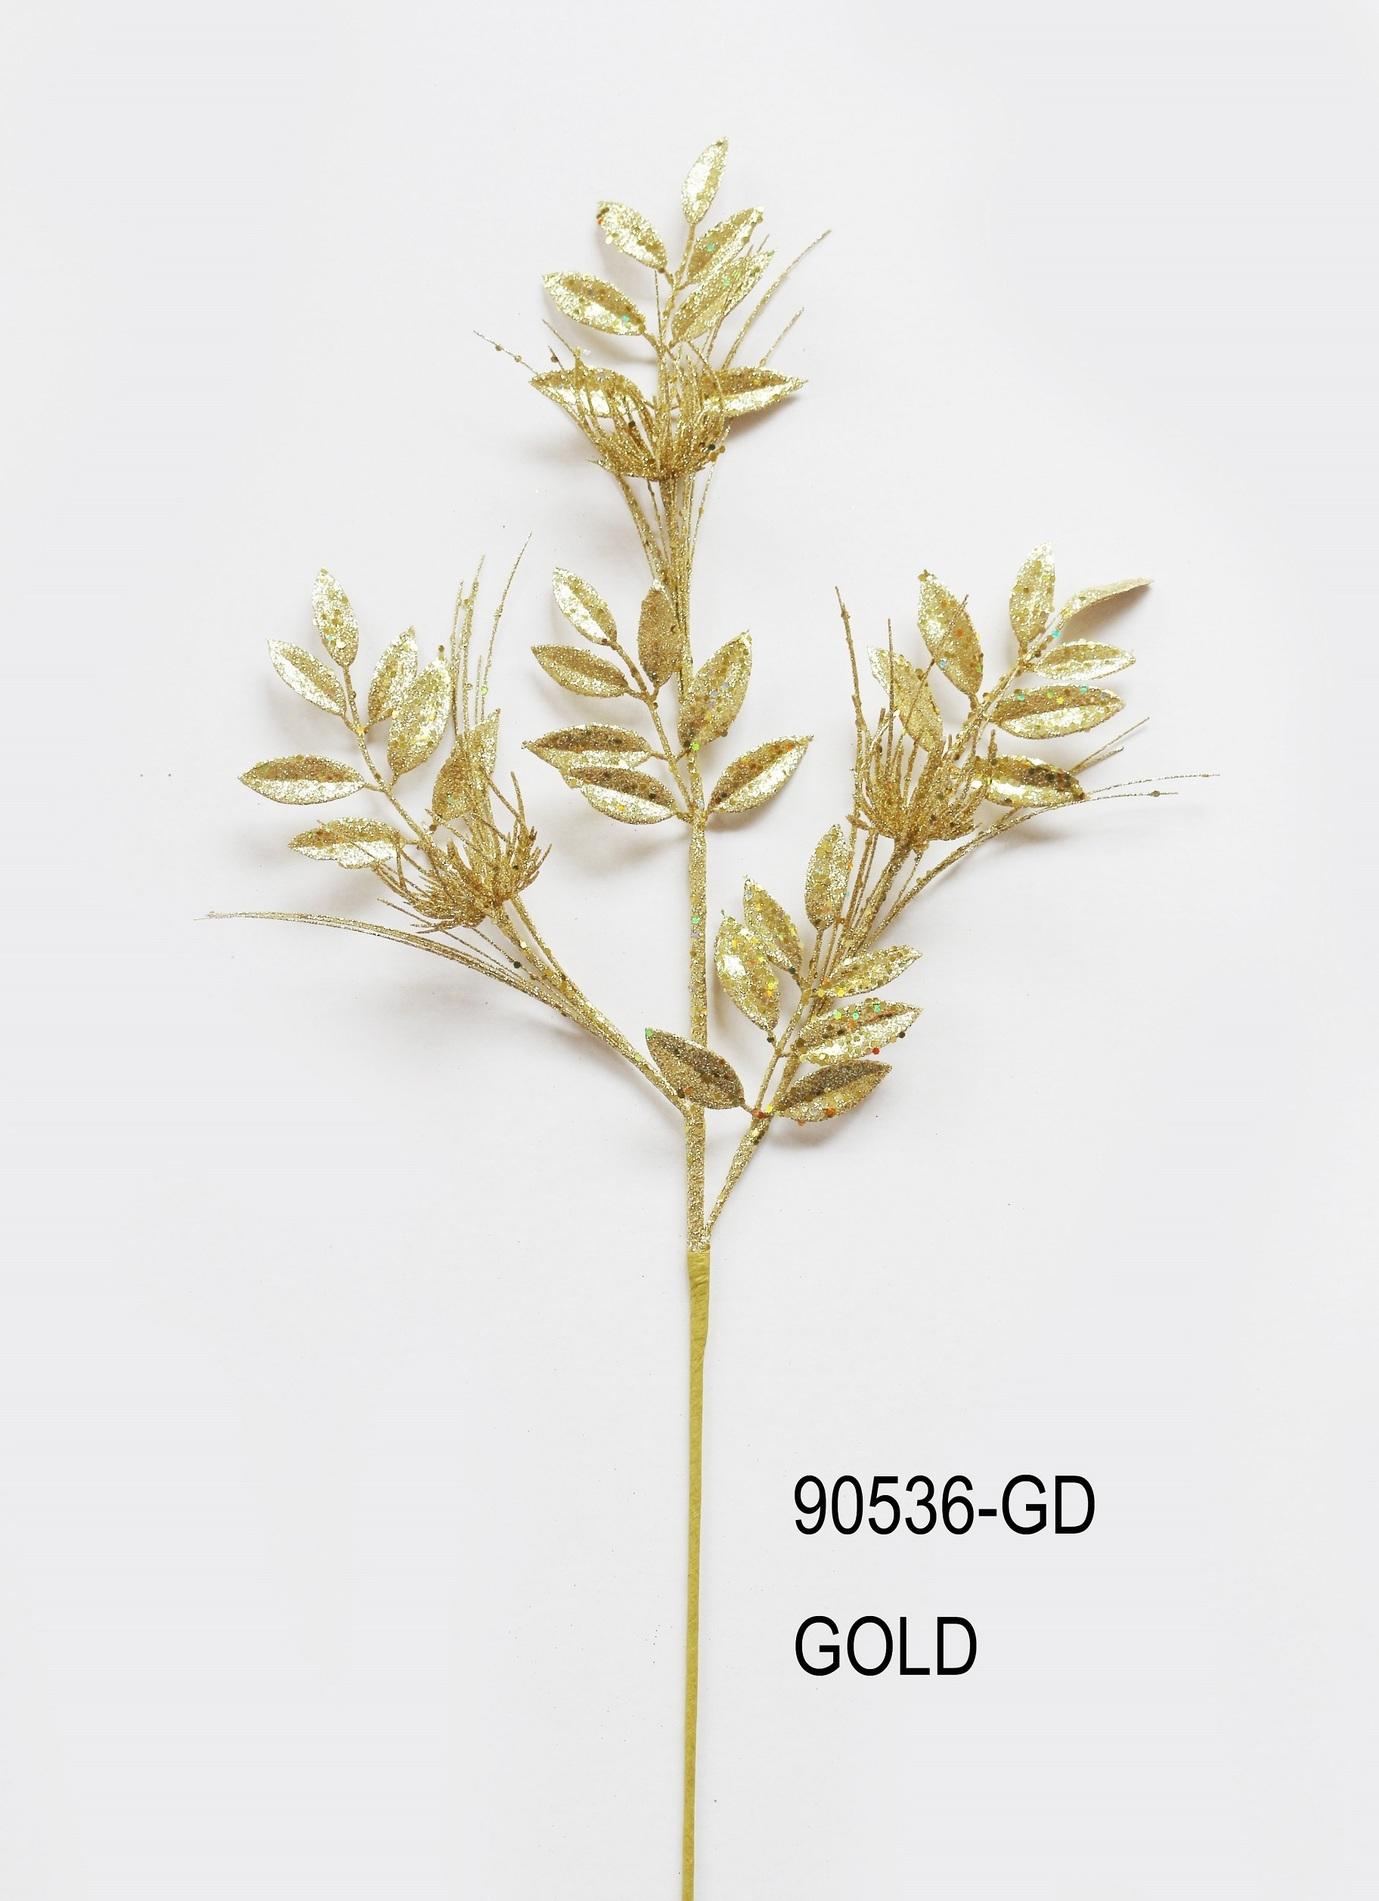 90536-GD